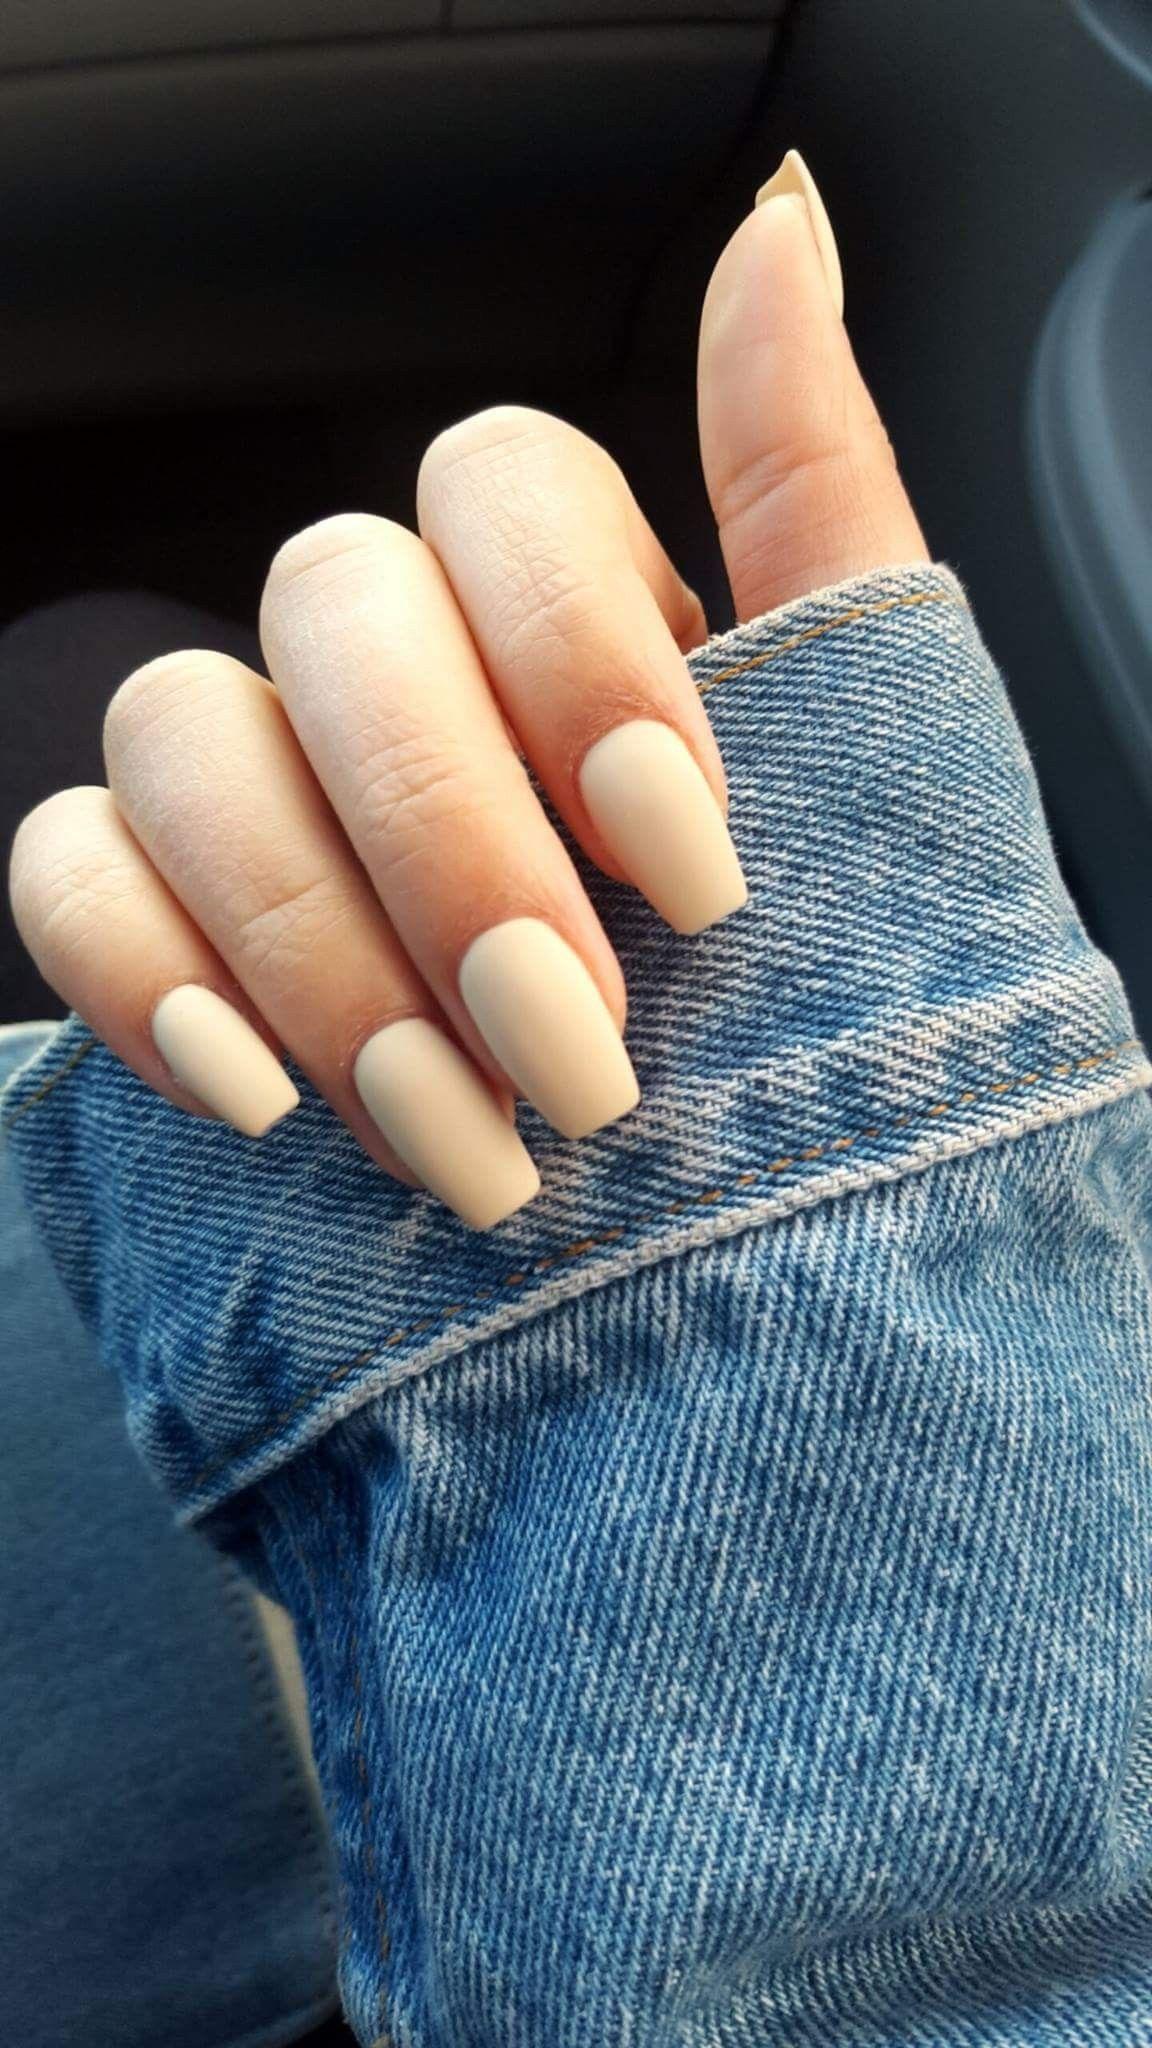 OPI Youre so Vanilla matte coffin nails